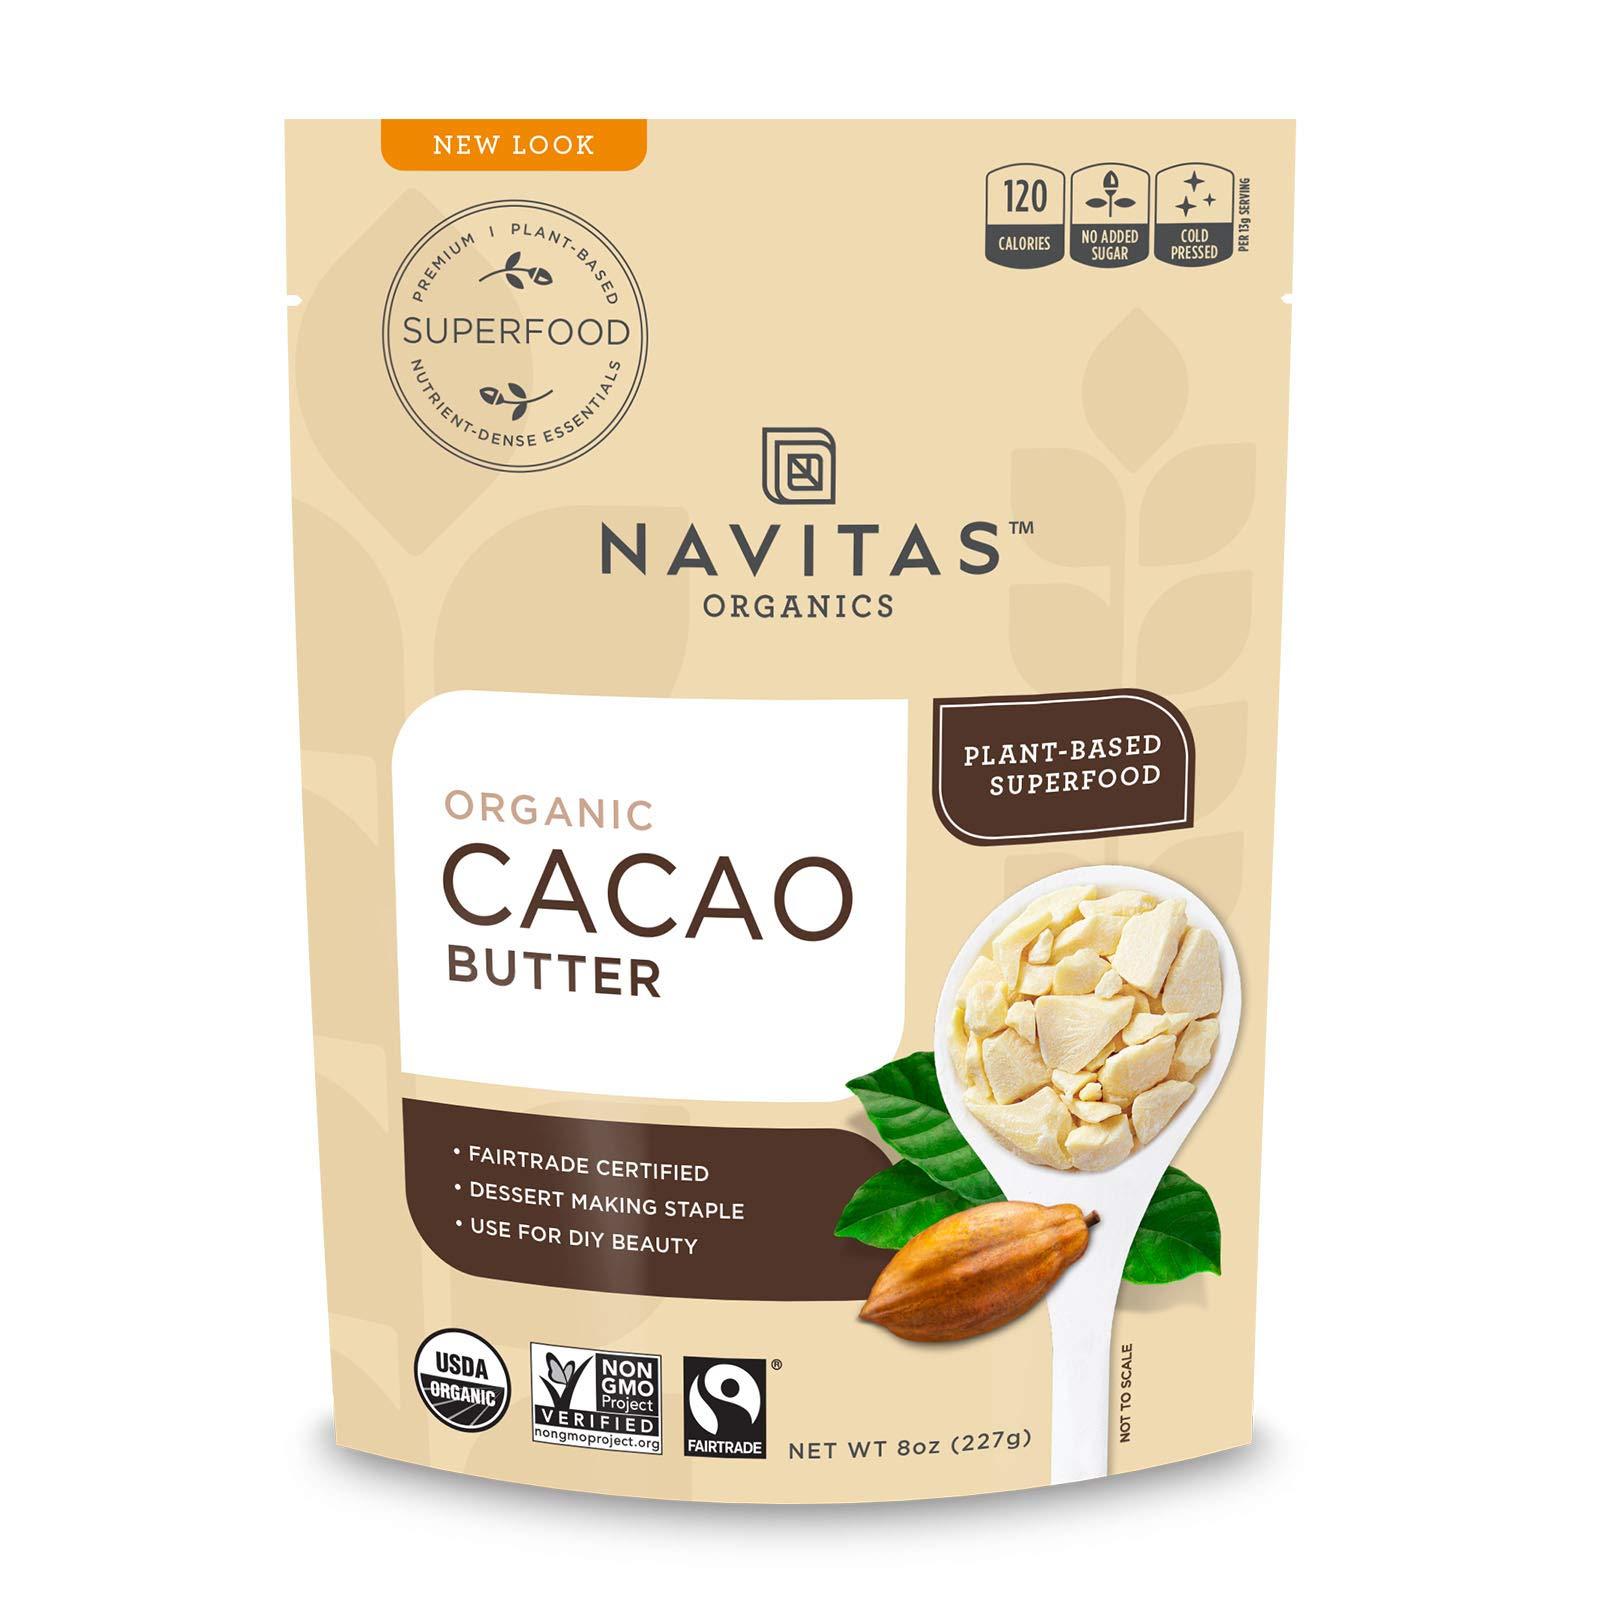 Navitas Organicsy, GlutenFree & Keto, Cacao Butter 8 Ounce